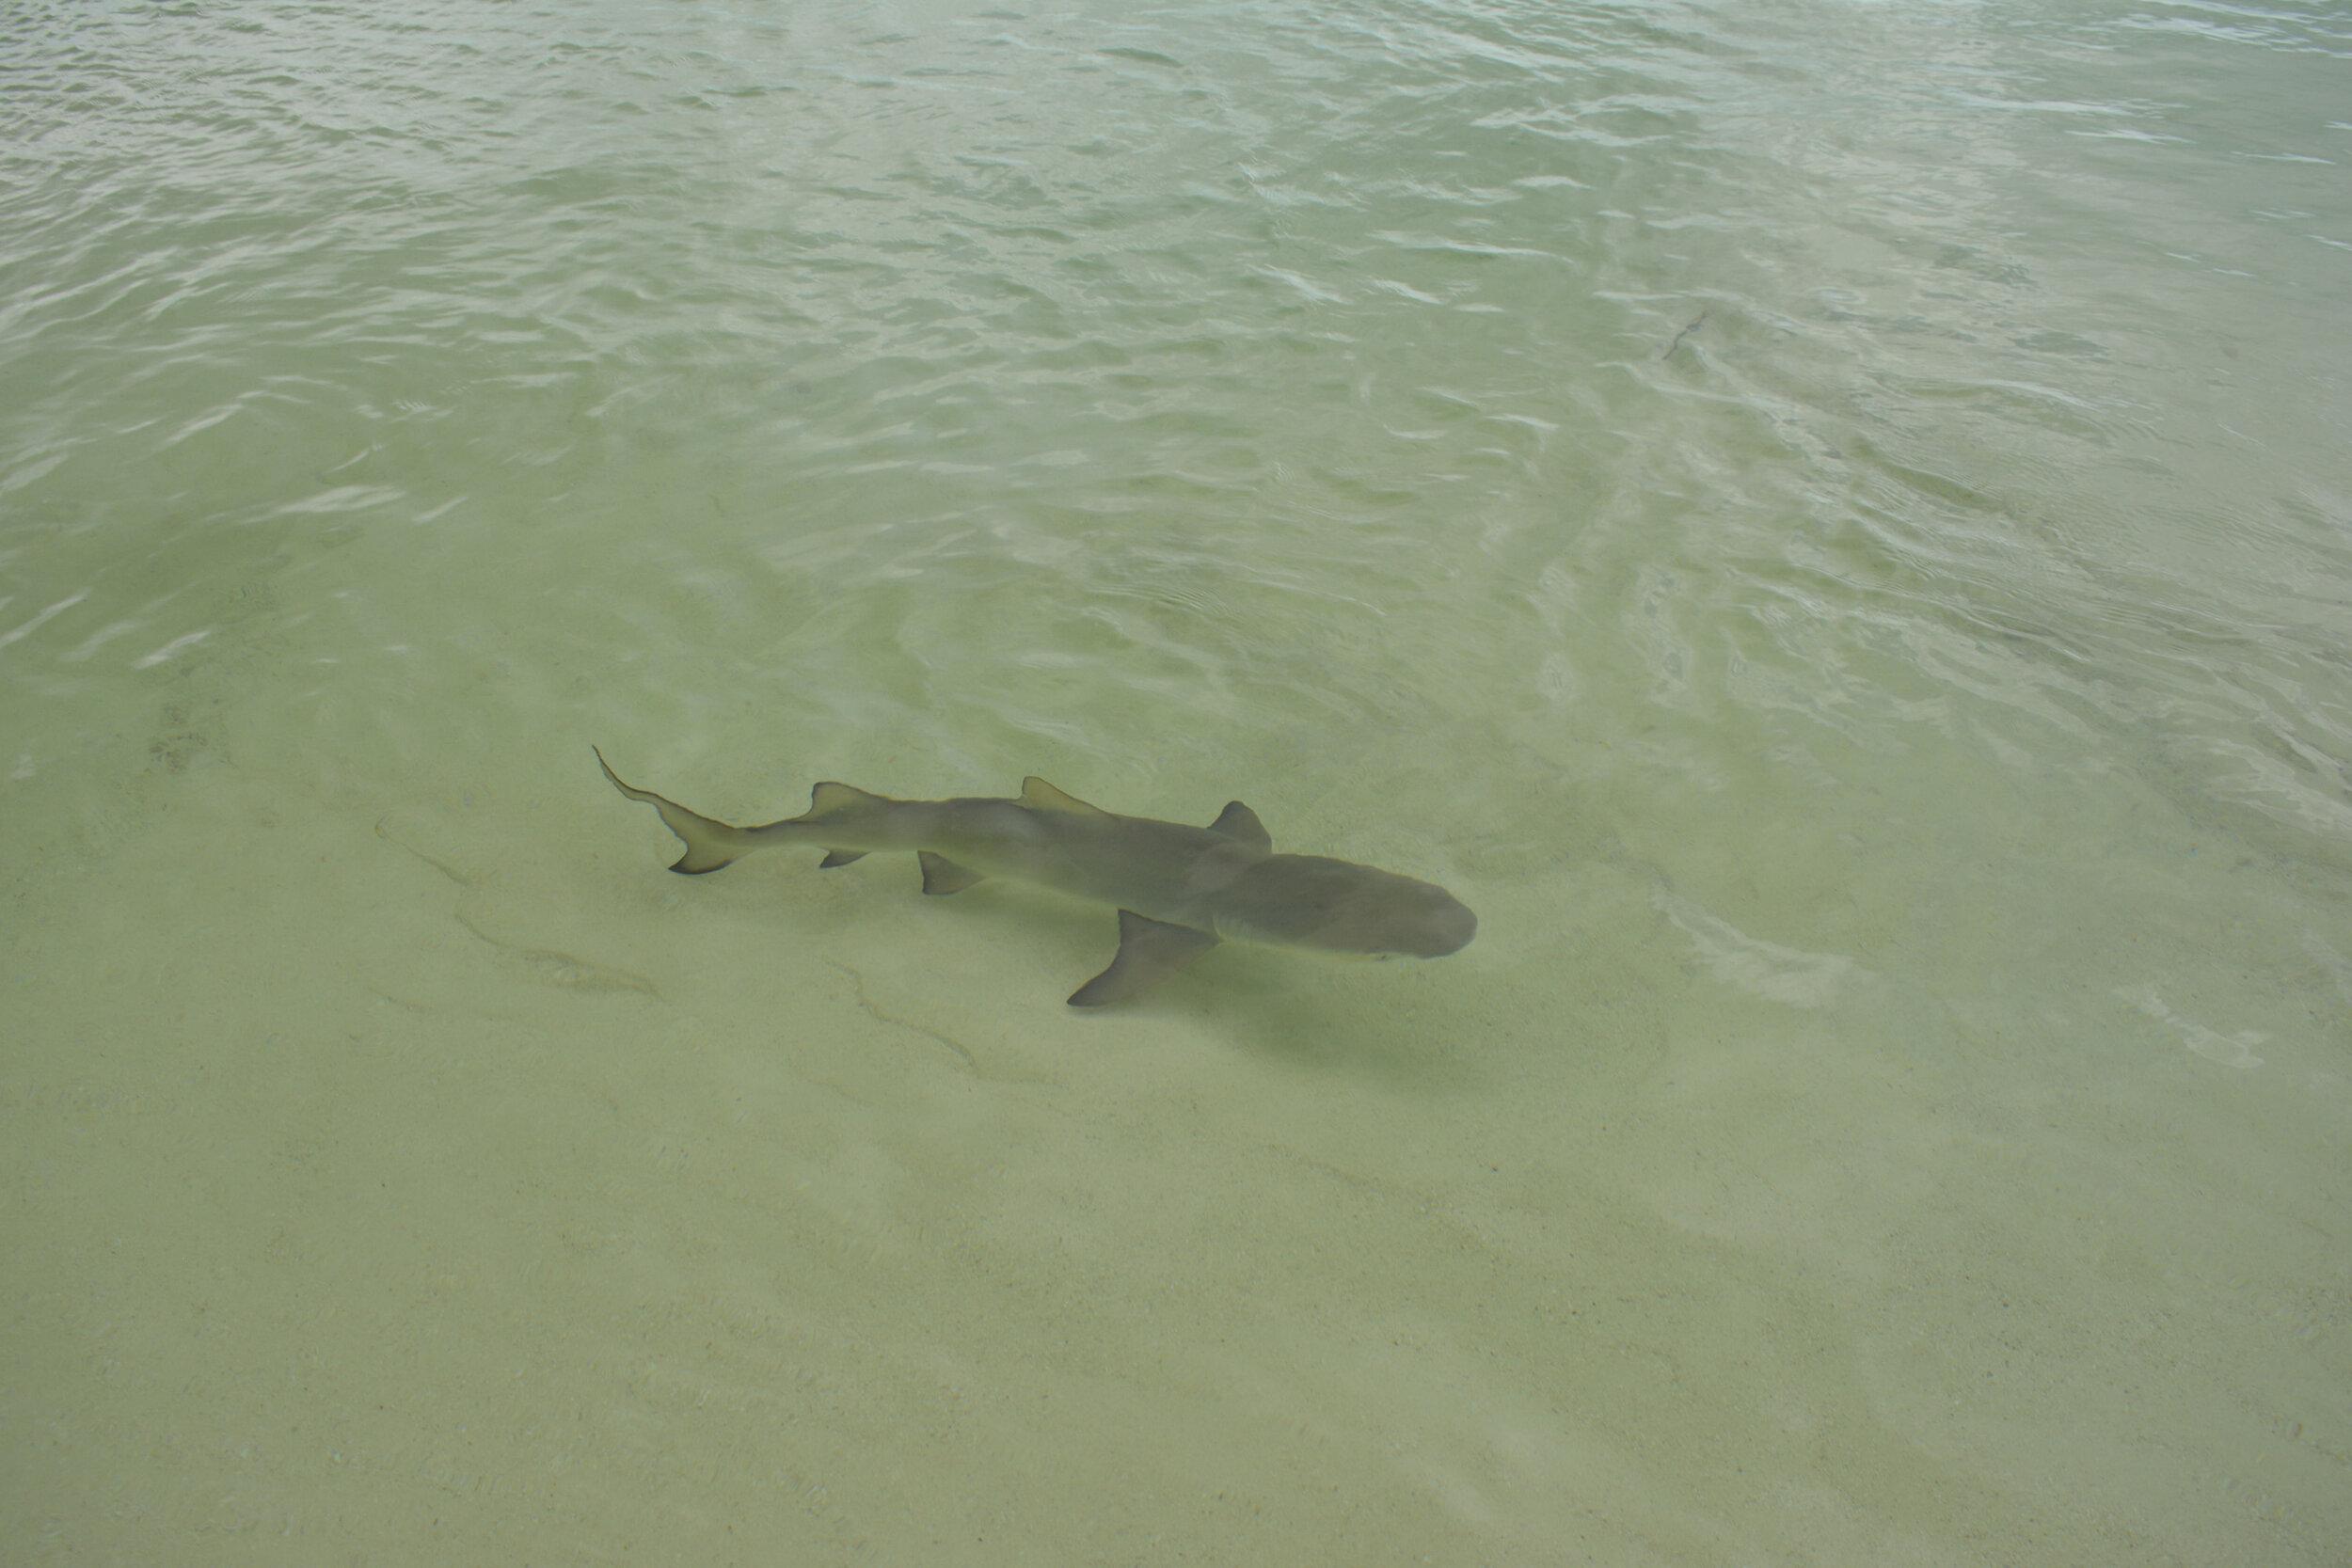 A shy lemon shark, one of approximately five